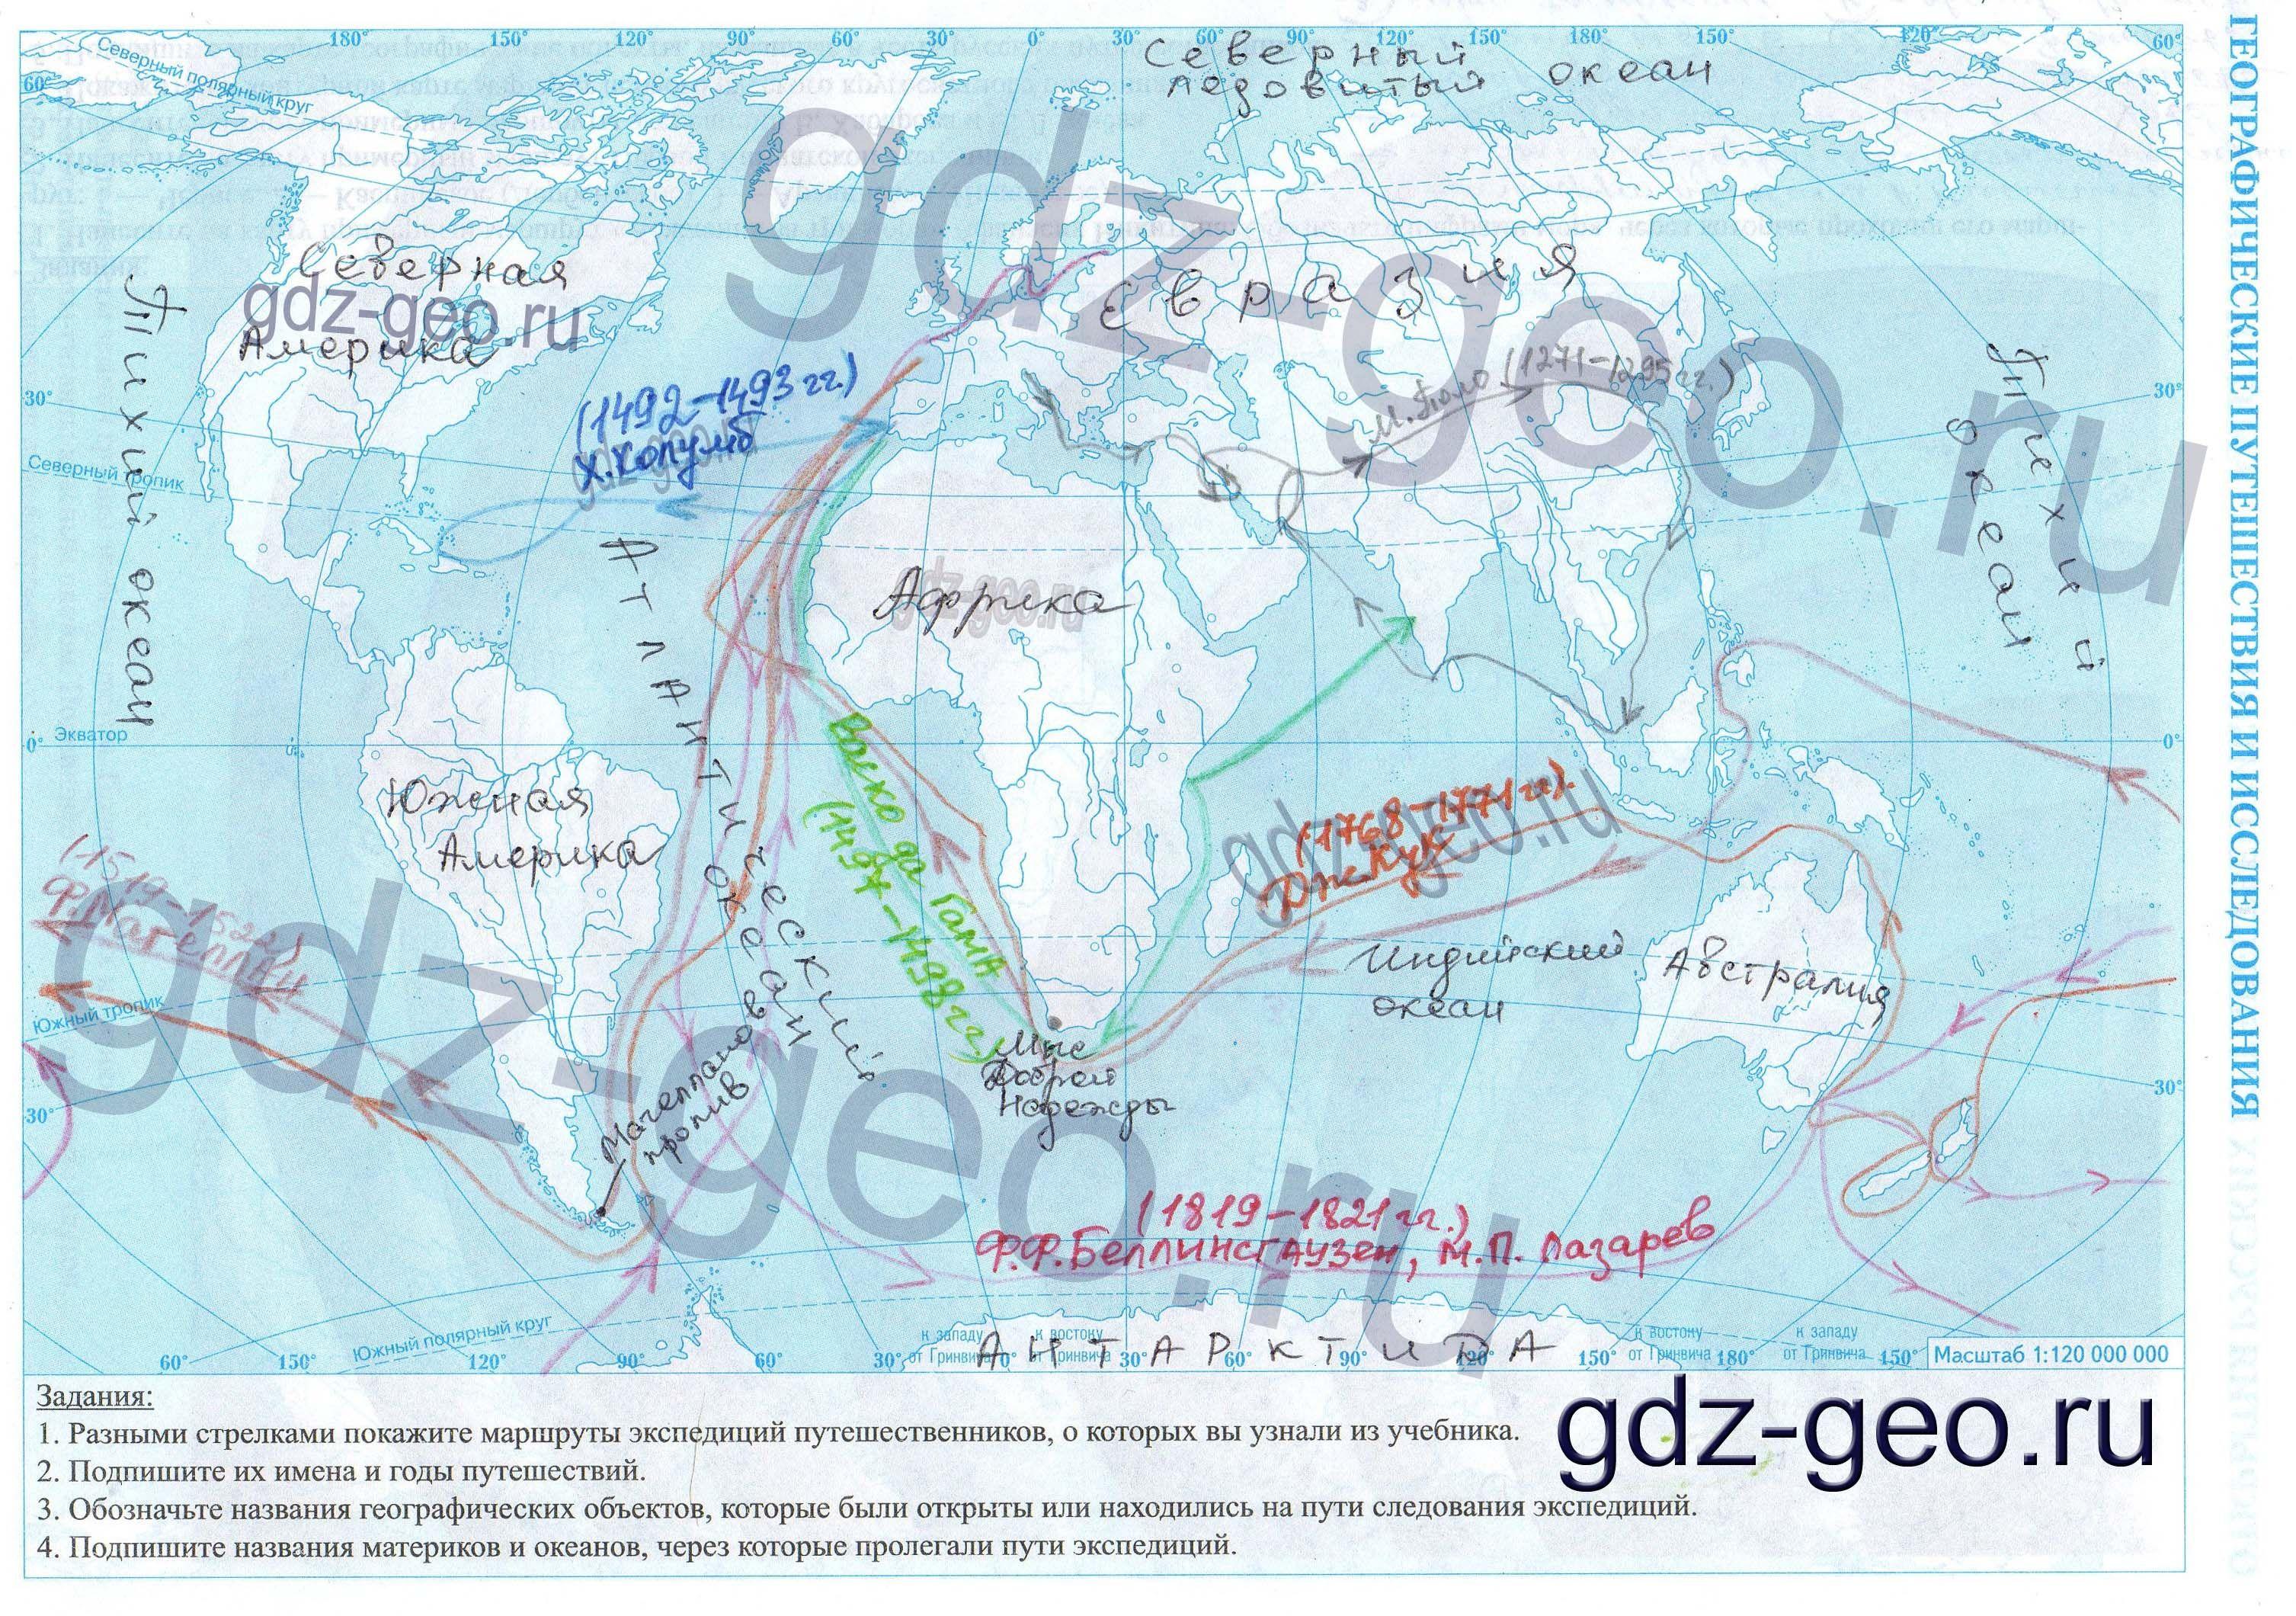 Решебник по атласу 7 класс география